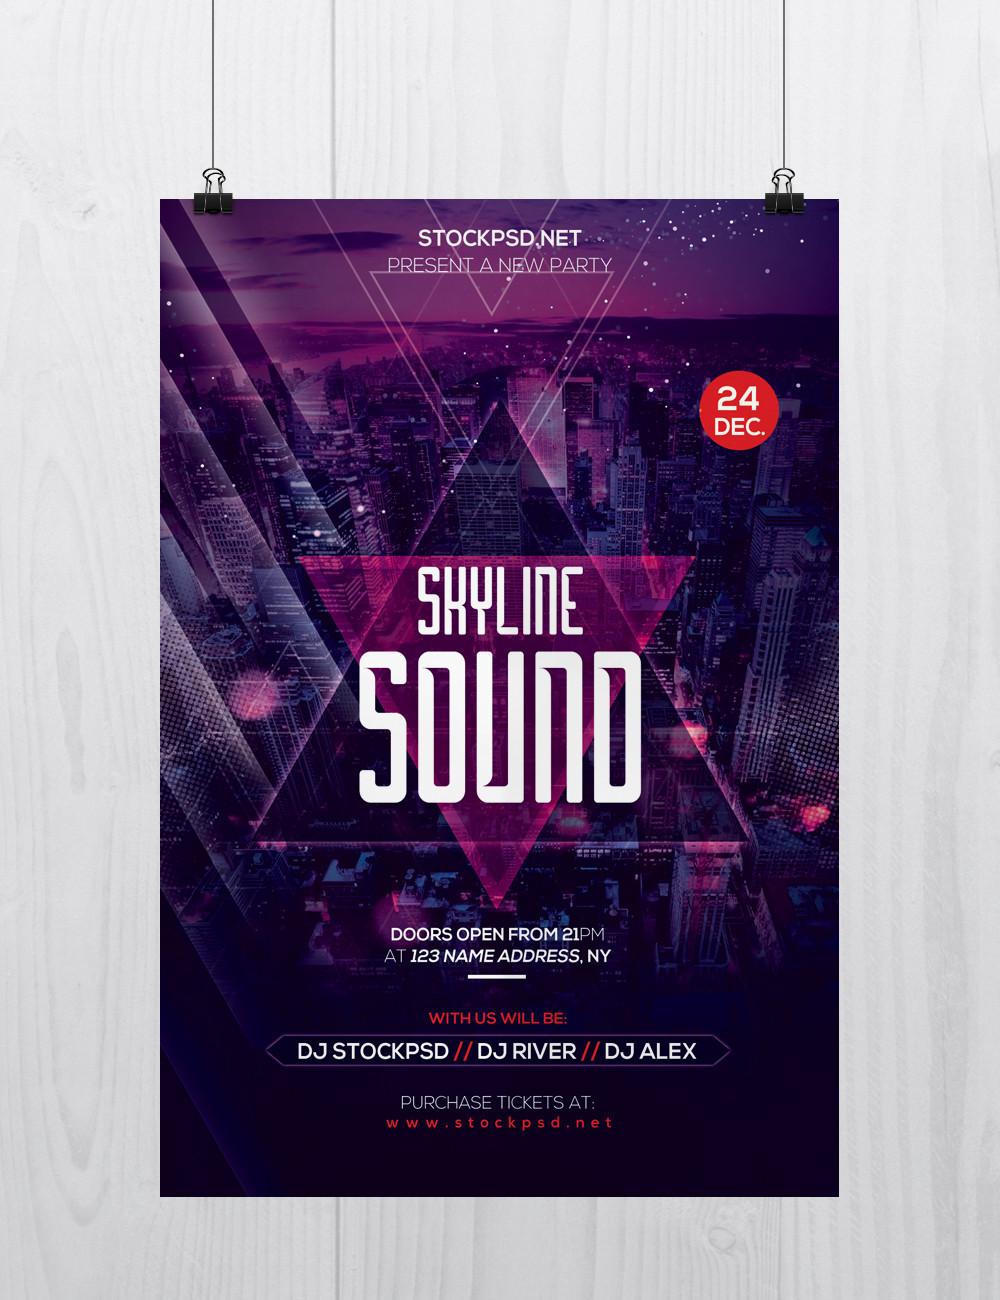 Skyline Sound – Download PSD Free Flyer Templates